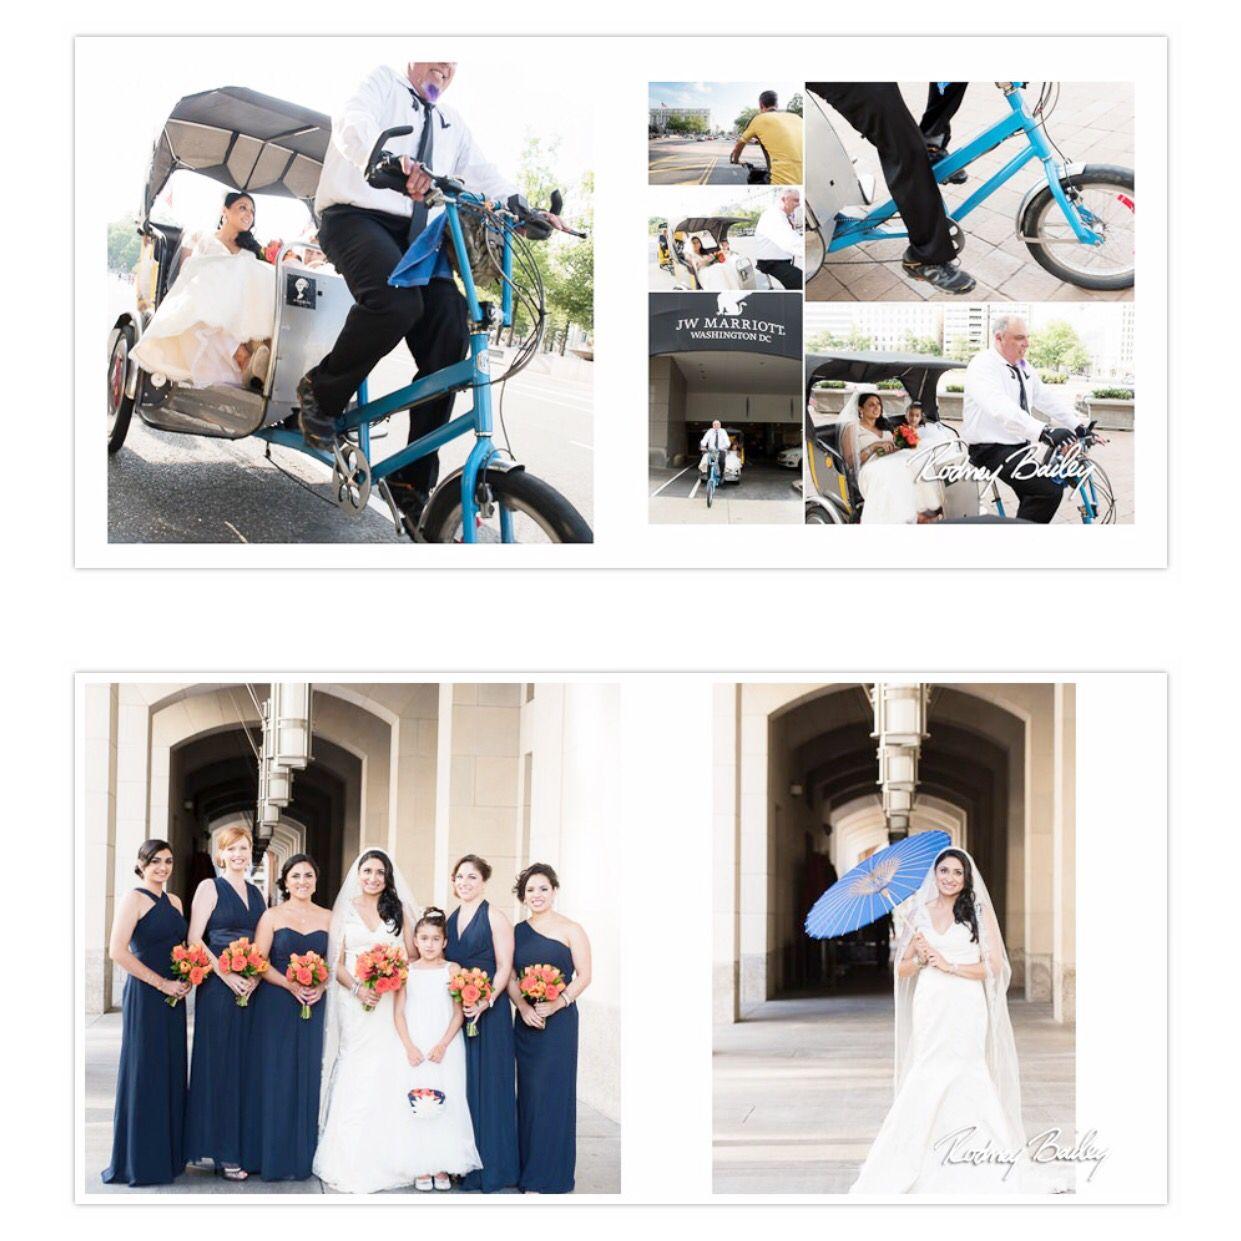 Wedding decorations in botswana january 2019 Галина Дмитриева sisoidyachkov on Pinterest